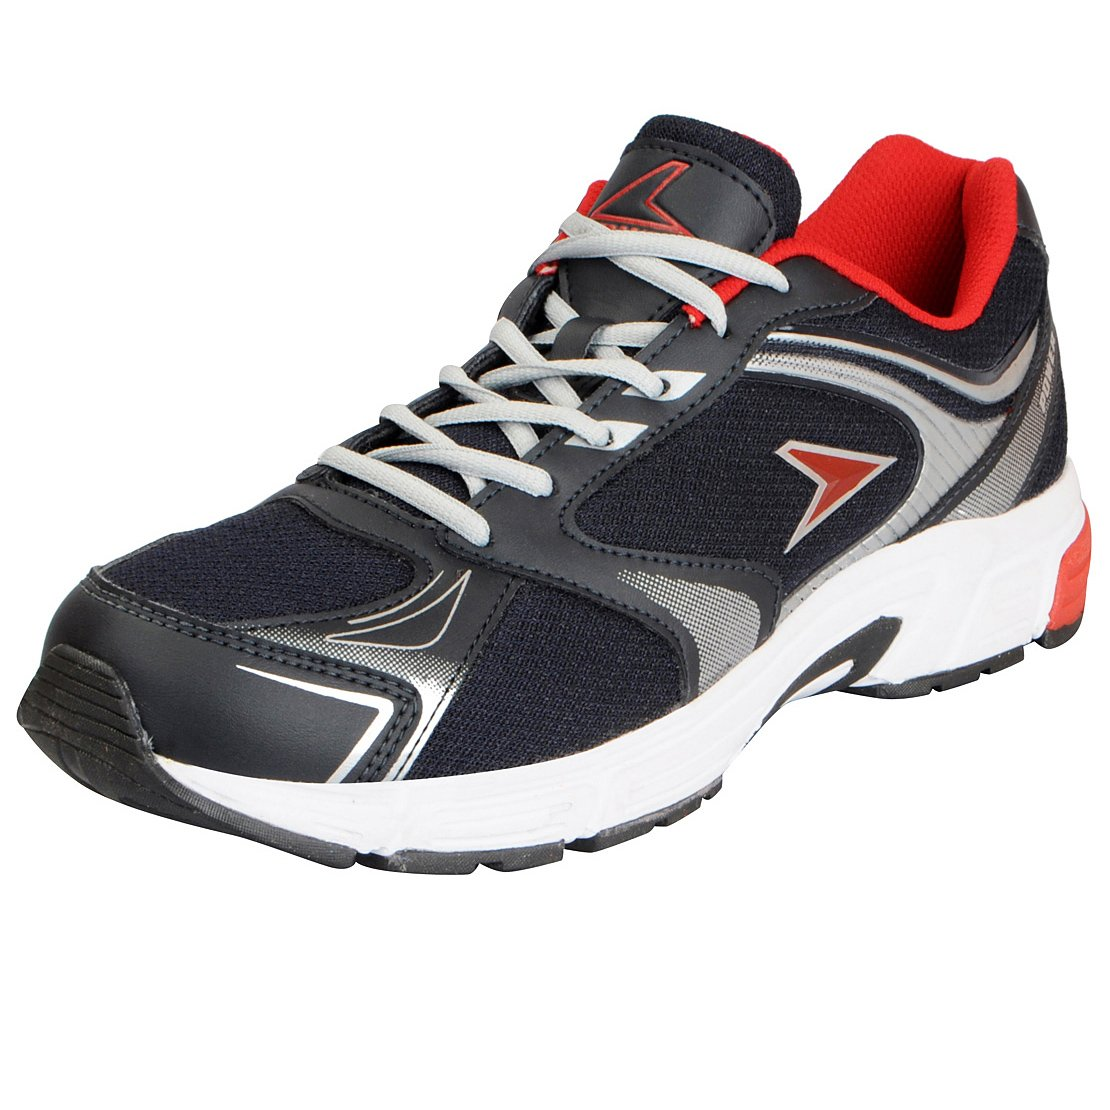 a7fec1d05bda5 BATA Men's Mesh Sports Running/Walking/Gym Shoes: Buy Online at Low ...